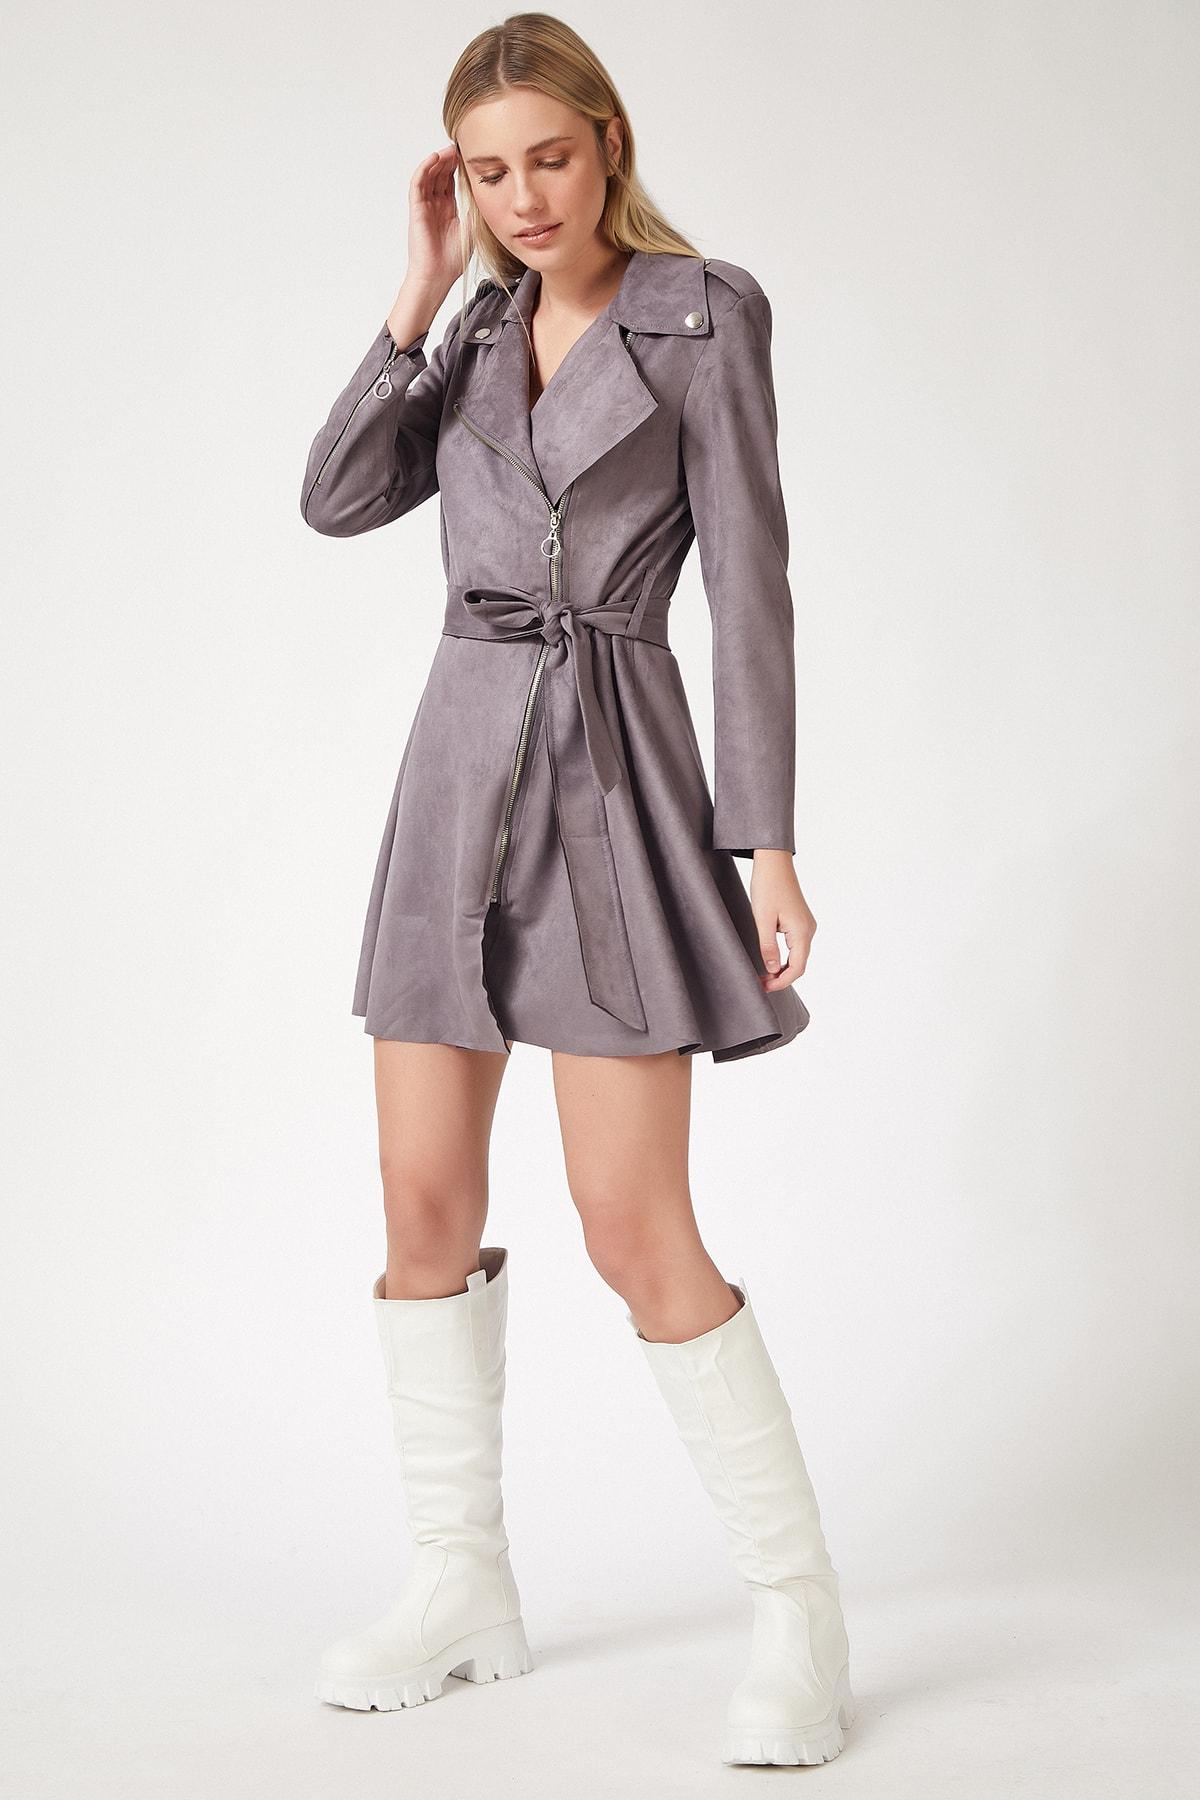 Happiness İst. Gri Süet Mini Trençkot Elbise